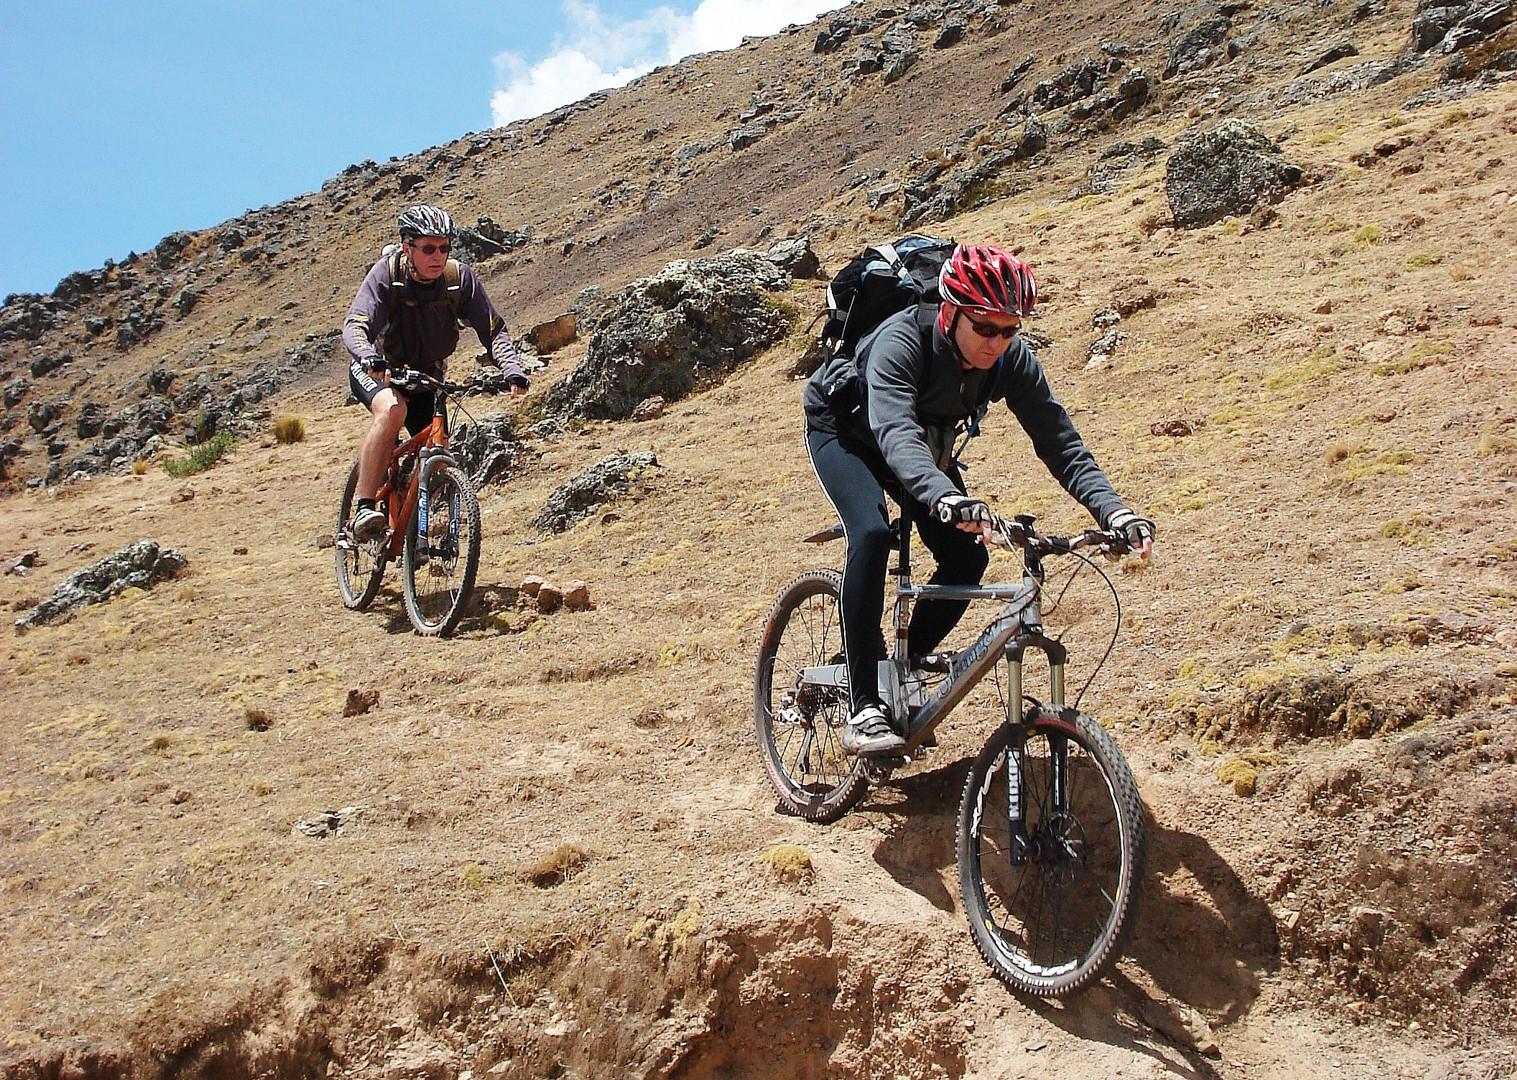 Straws peru 2007 (178).jpg - Peru - Sacred Singletrack - Mountain Biking